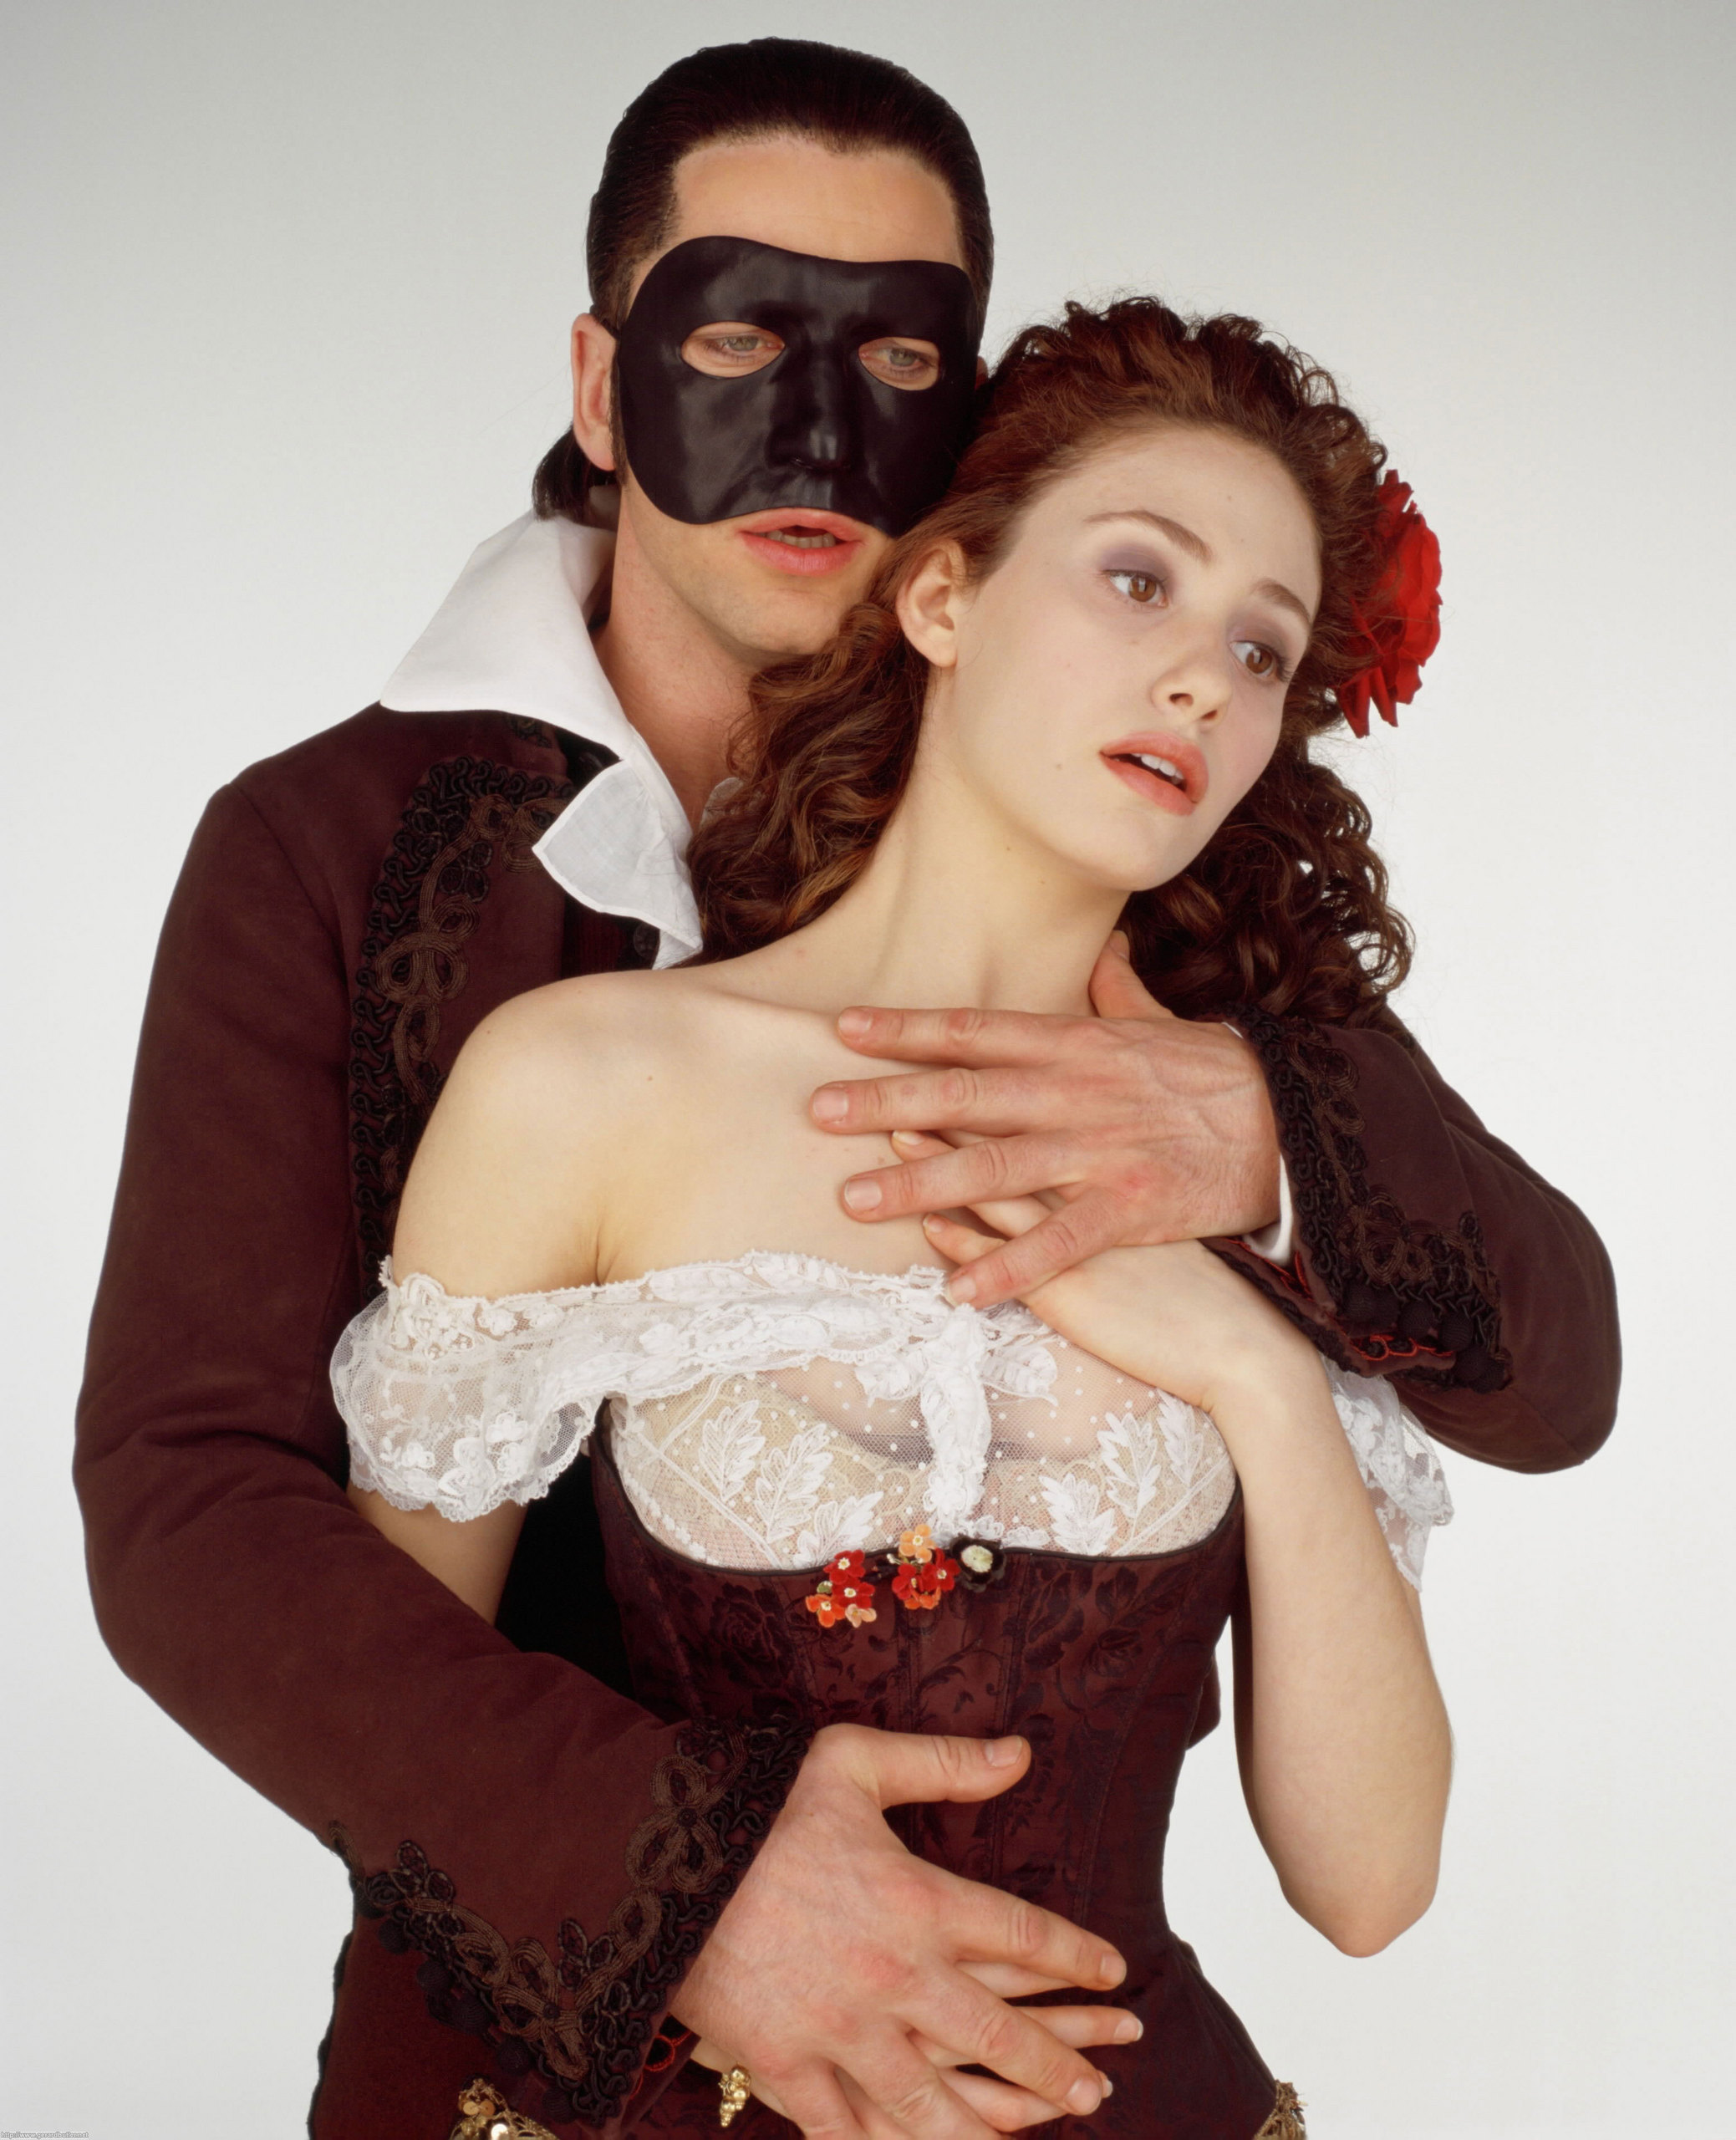 Don Juan / Point of No Return - ALW's Phantom of the Opera